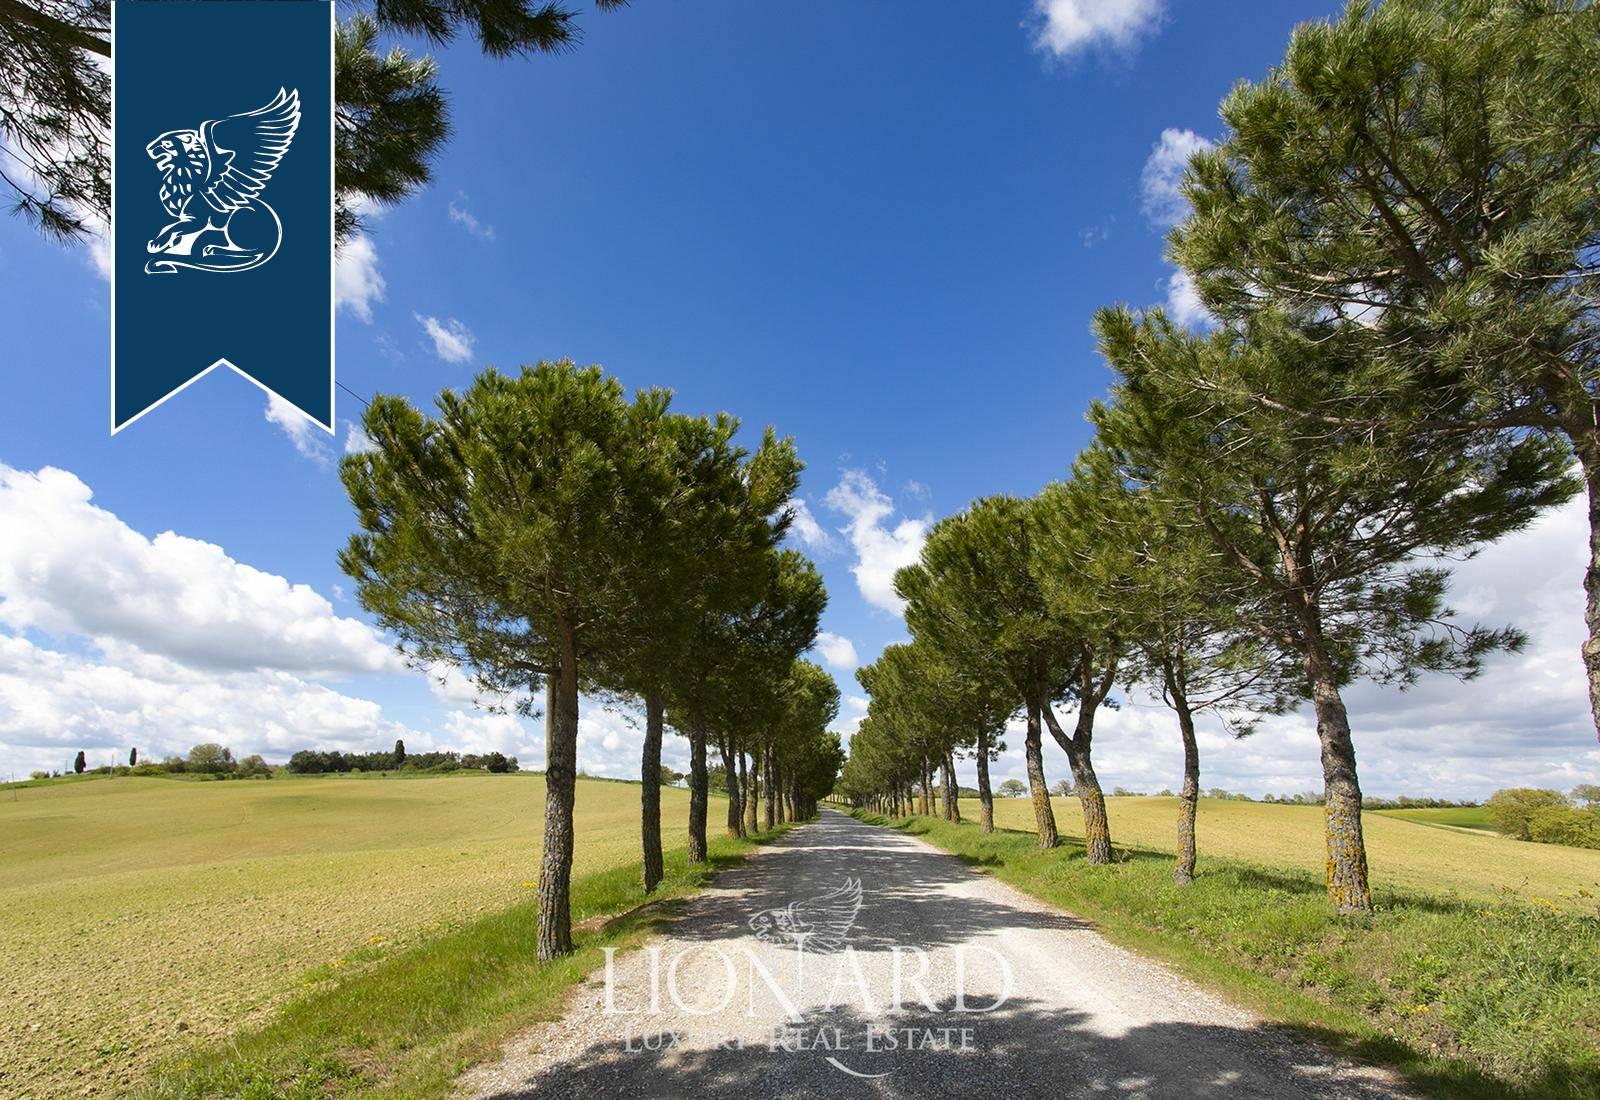 Agriturismo in Vendita a Montepulciano: 0 locali, 700 mq - Foto 4